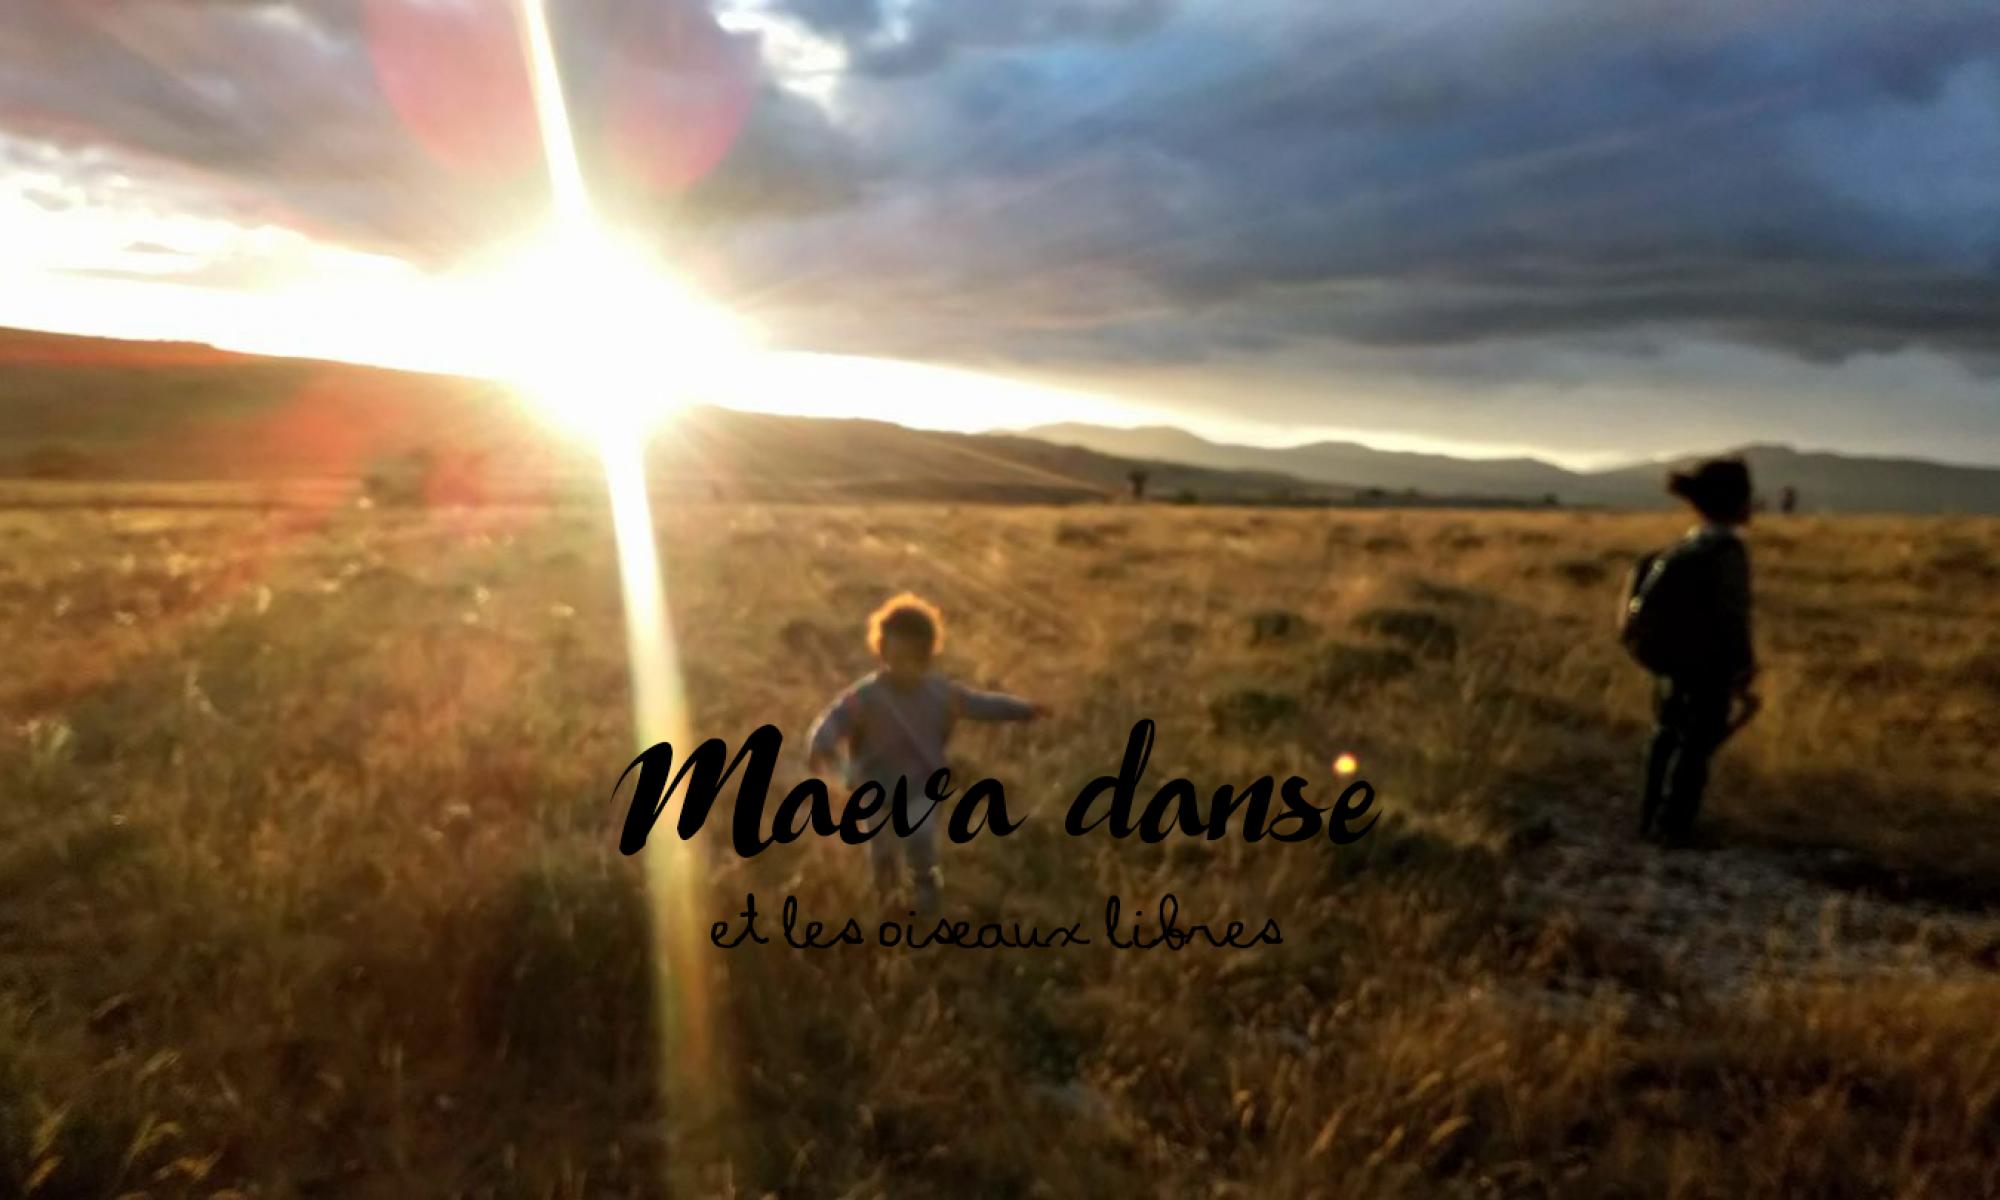 Maeva danse